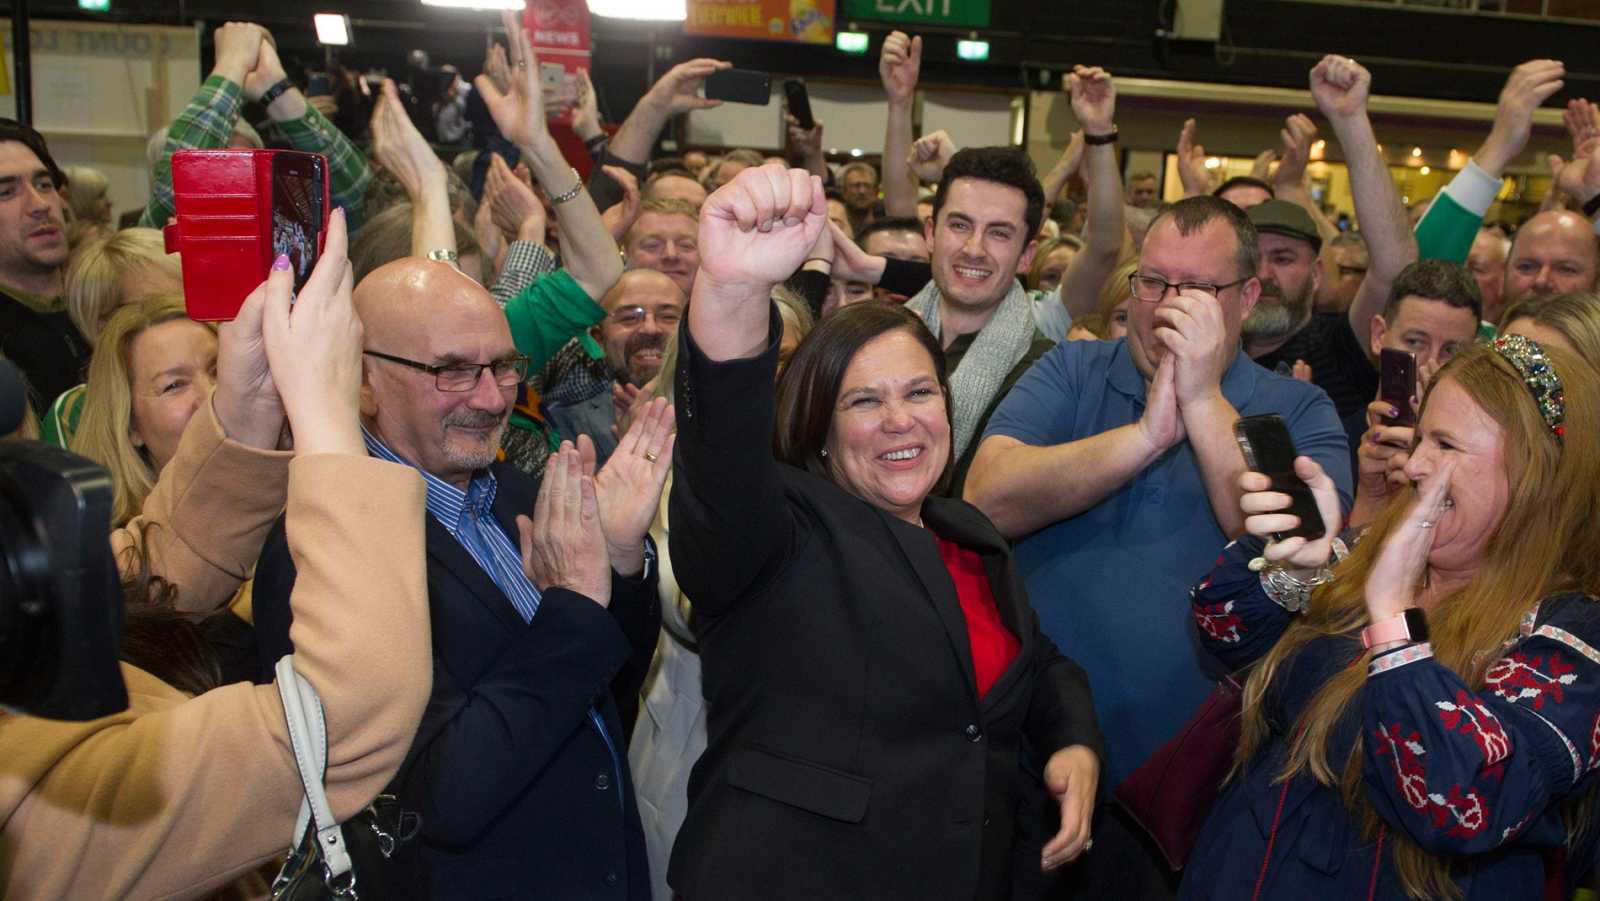 La líder del Sinn Féin negociará para formar gobierno en Irlanda